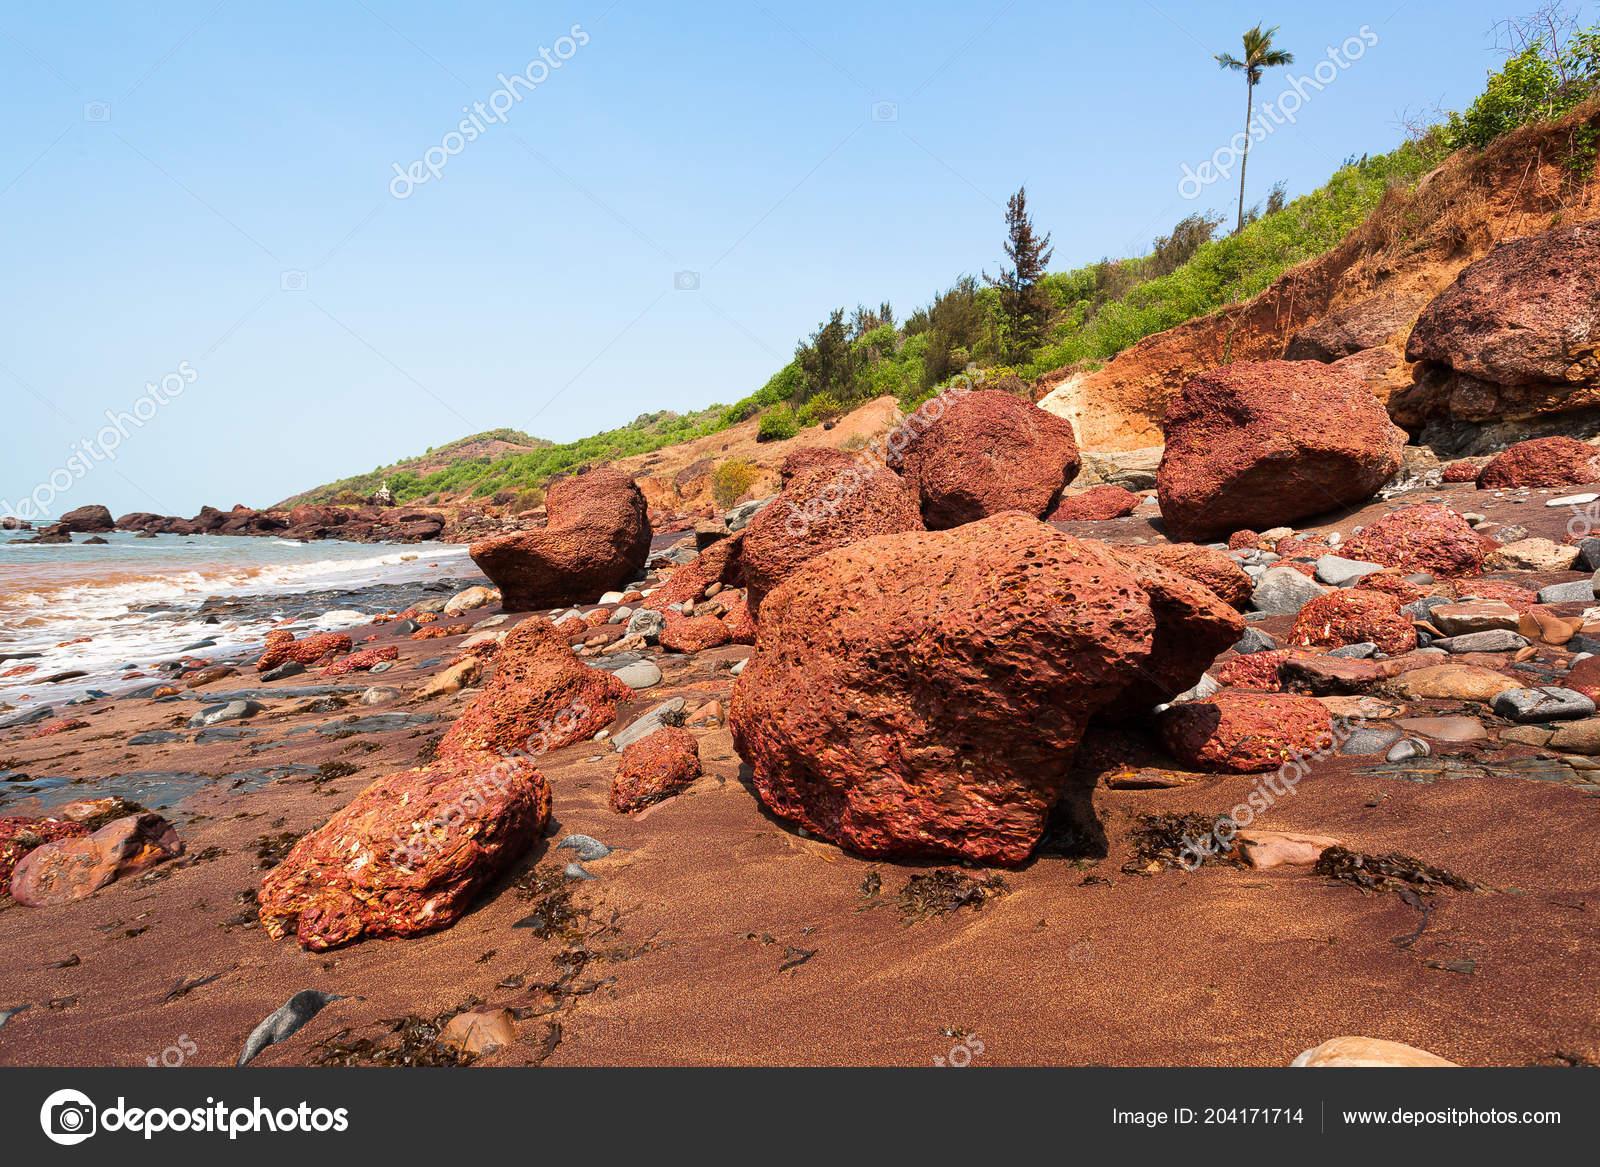 Goa Rocky Seashore Coastline Landscape Stock Photo C Bergamont